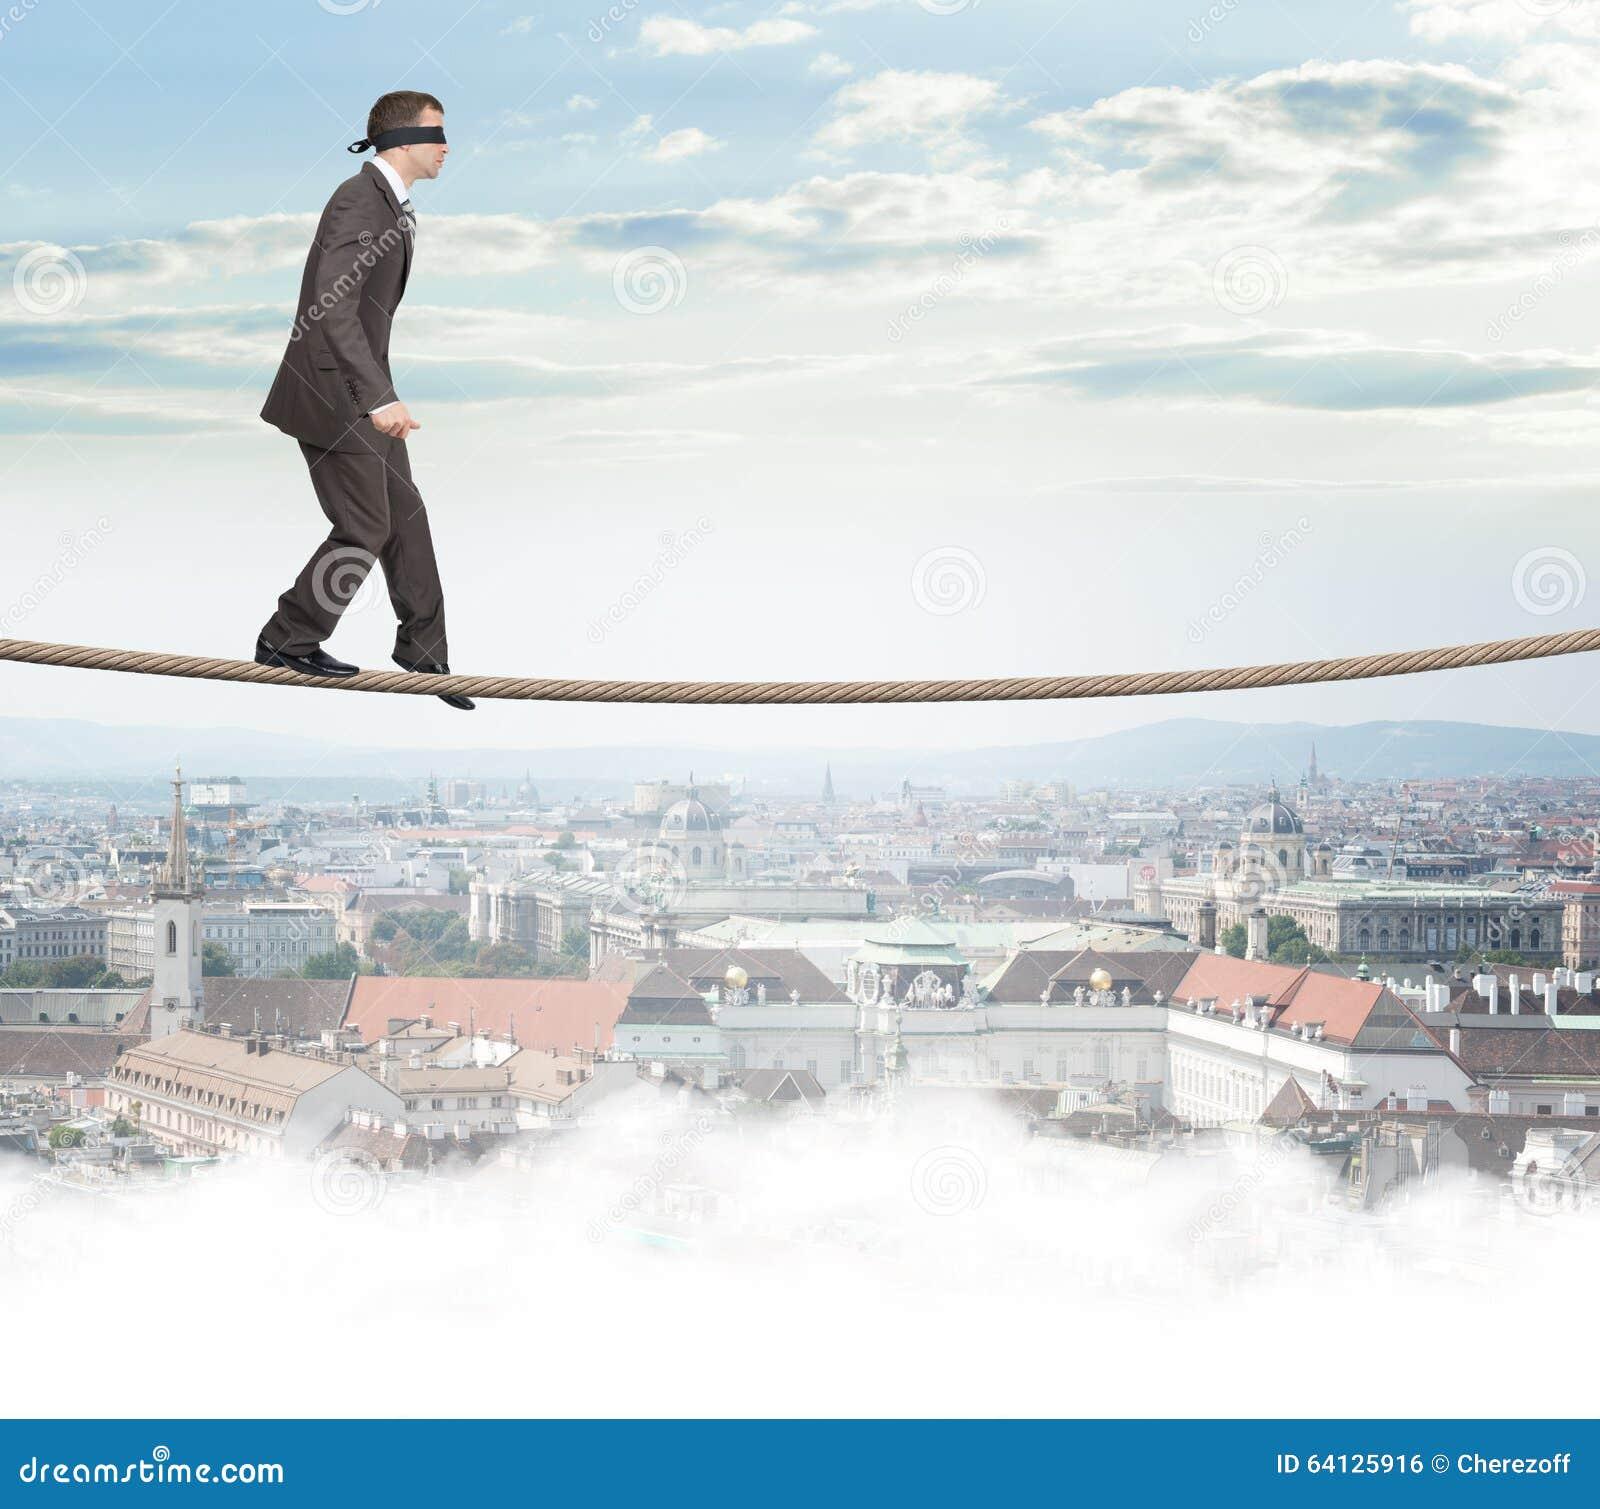 Man With Closed Eyes Softly Walking On Rope Stock Photo